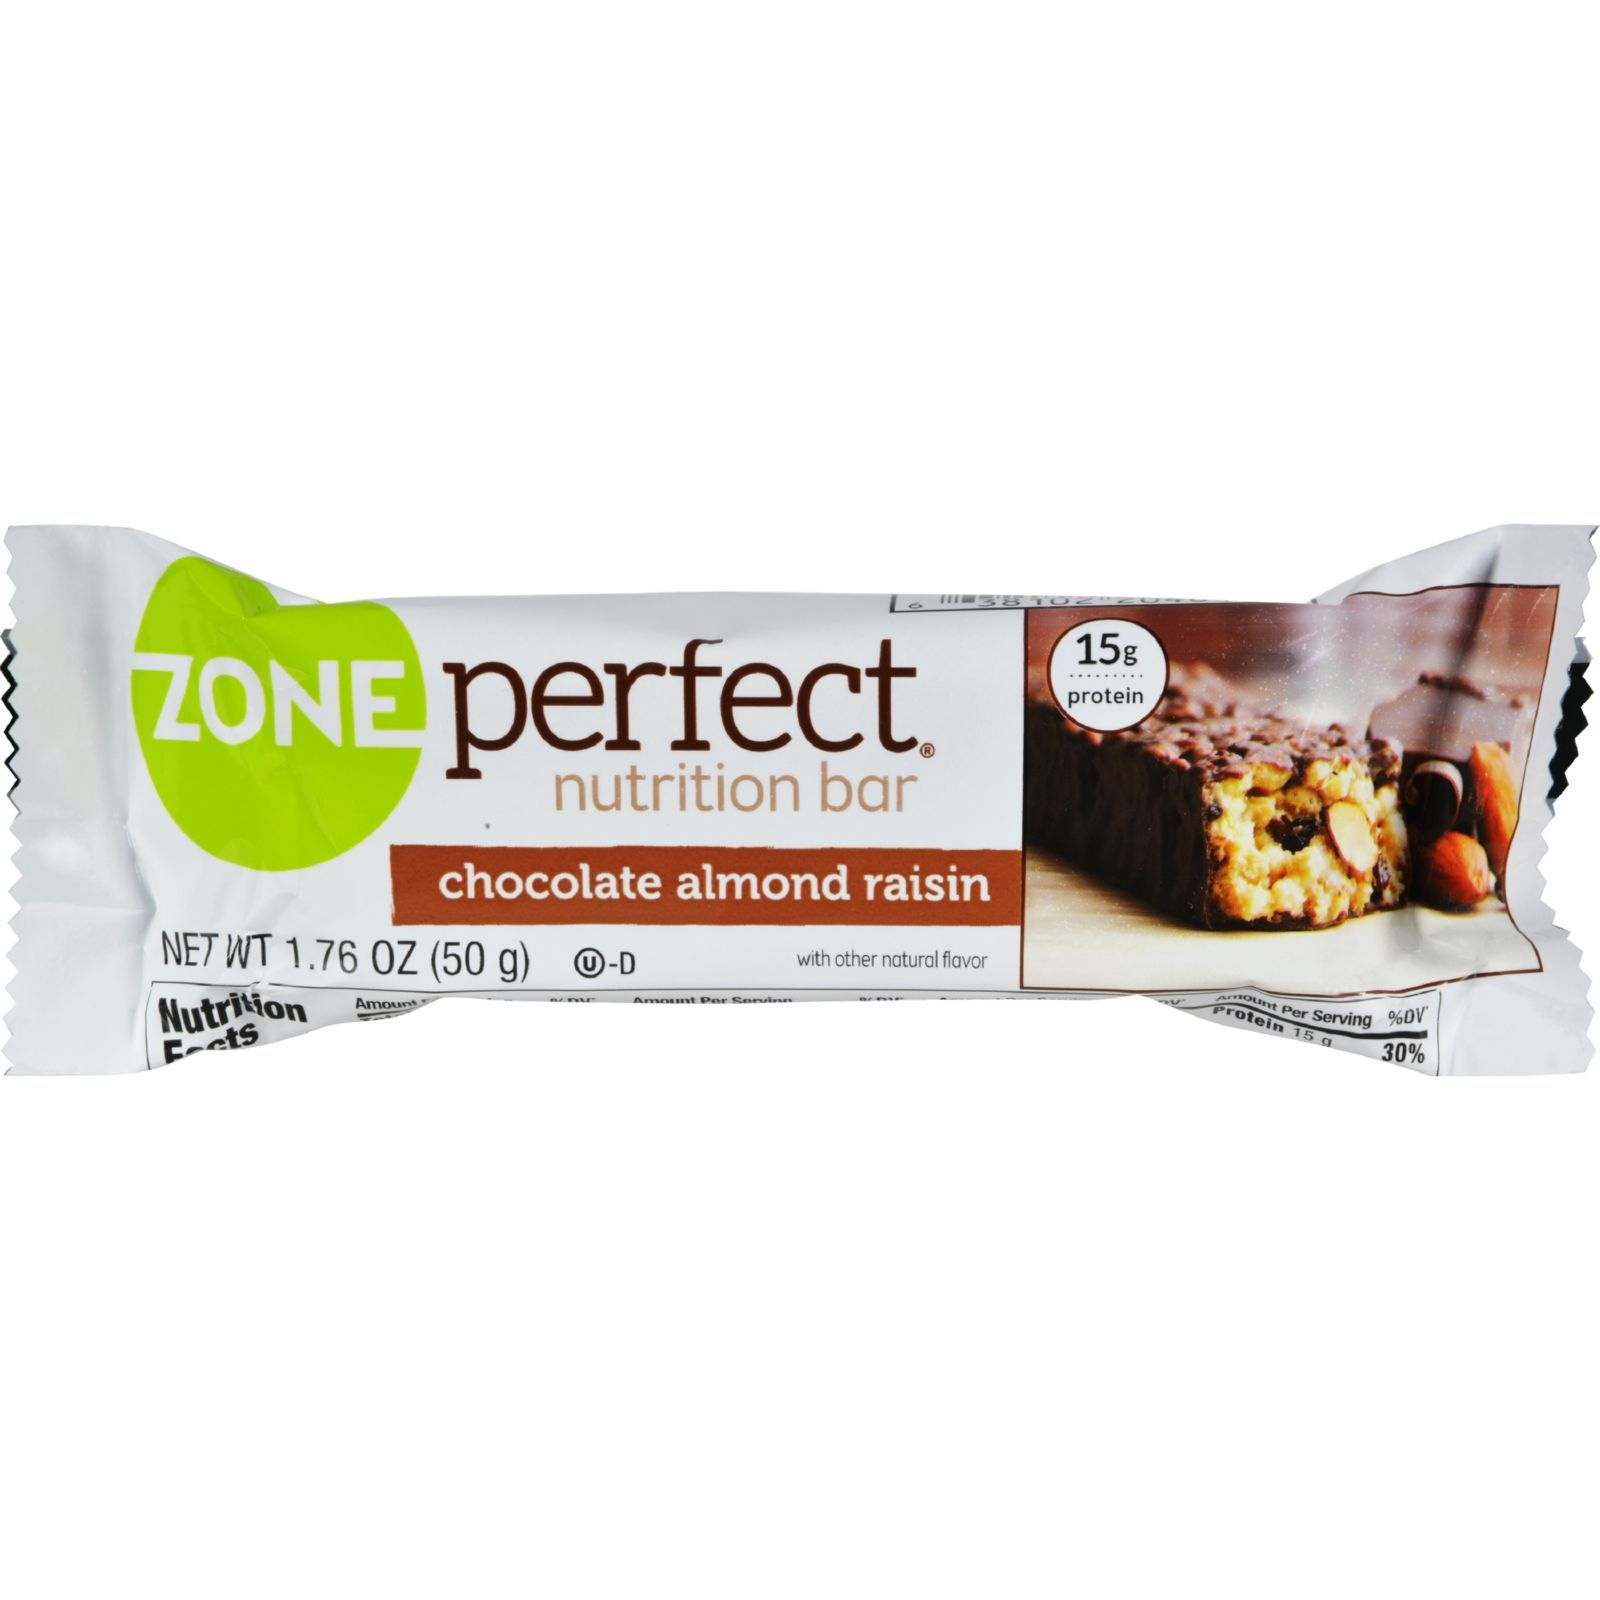 Zone Nutrition Bar - Chocolate Almond Raisin - Case of 12 - 1.76 oz